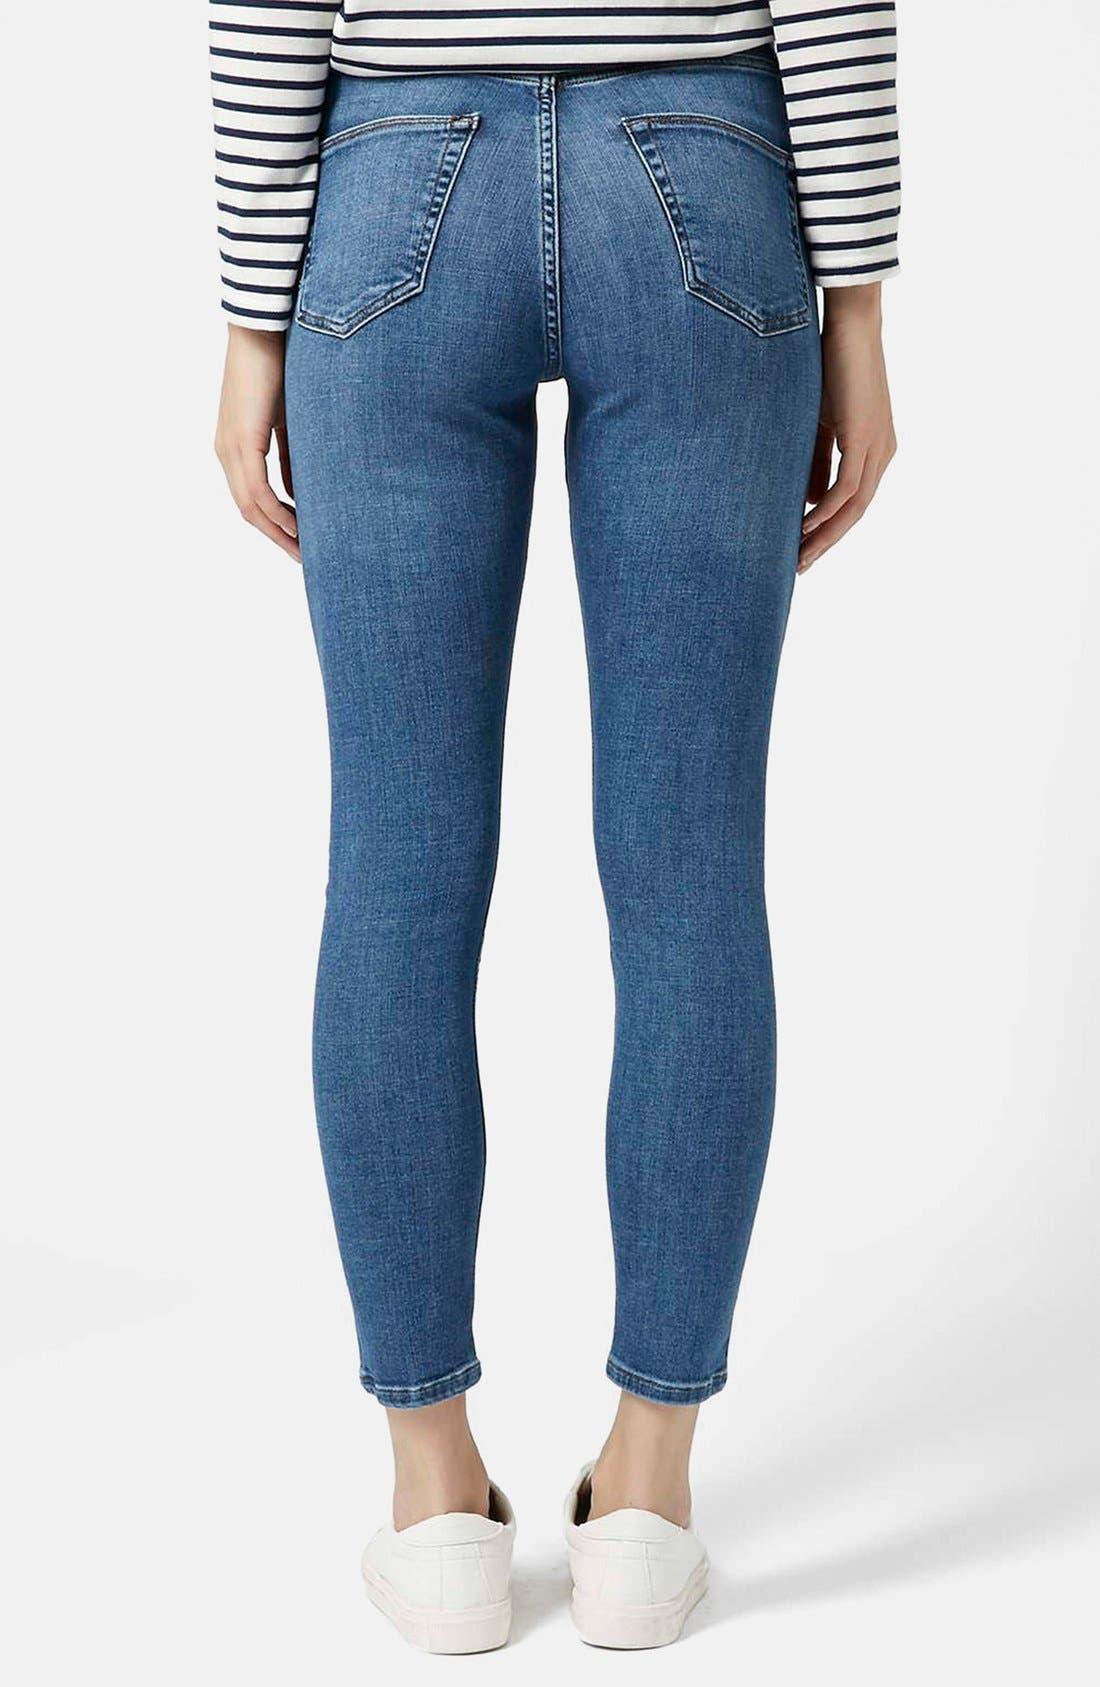 Alternate Image 2  - Topshop Moto 'Cain' High Rise Ankle Jeans (Blue) (Short)